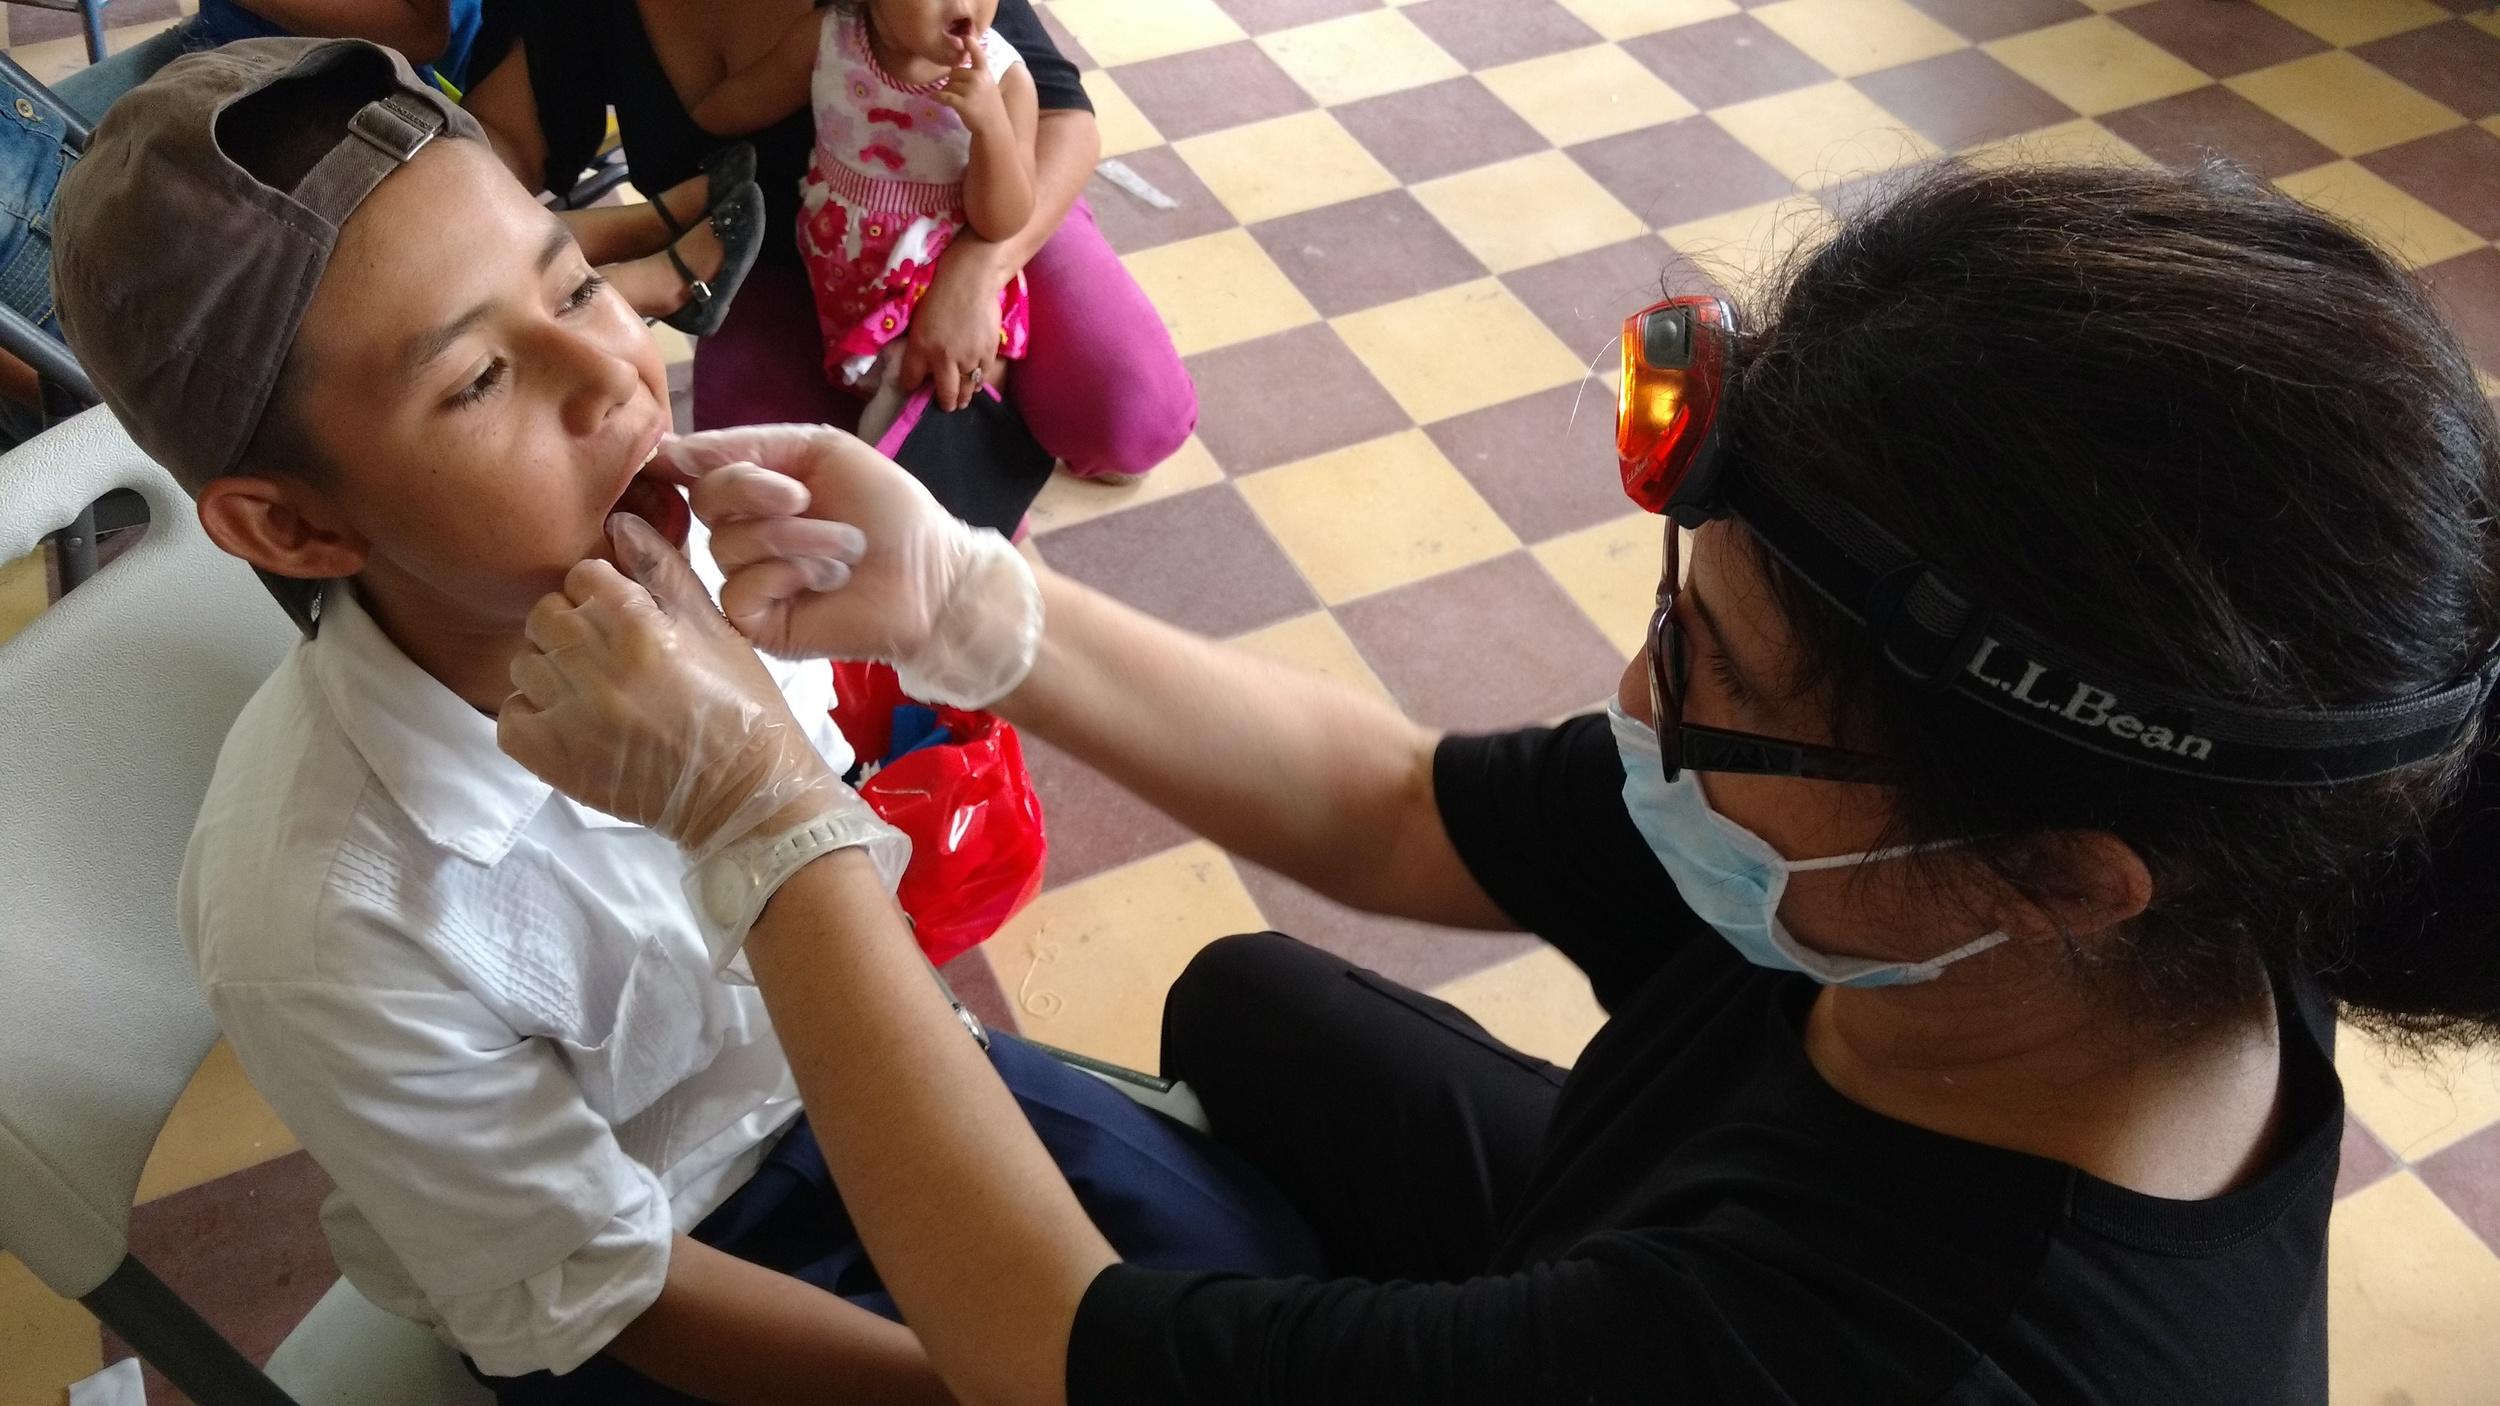 Dr. Tinka Kornerup applying fluroride to this young man's teeth.